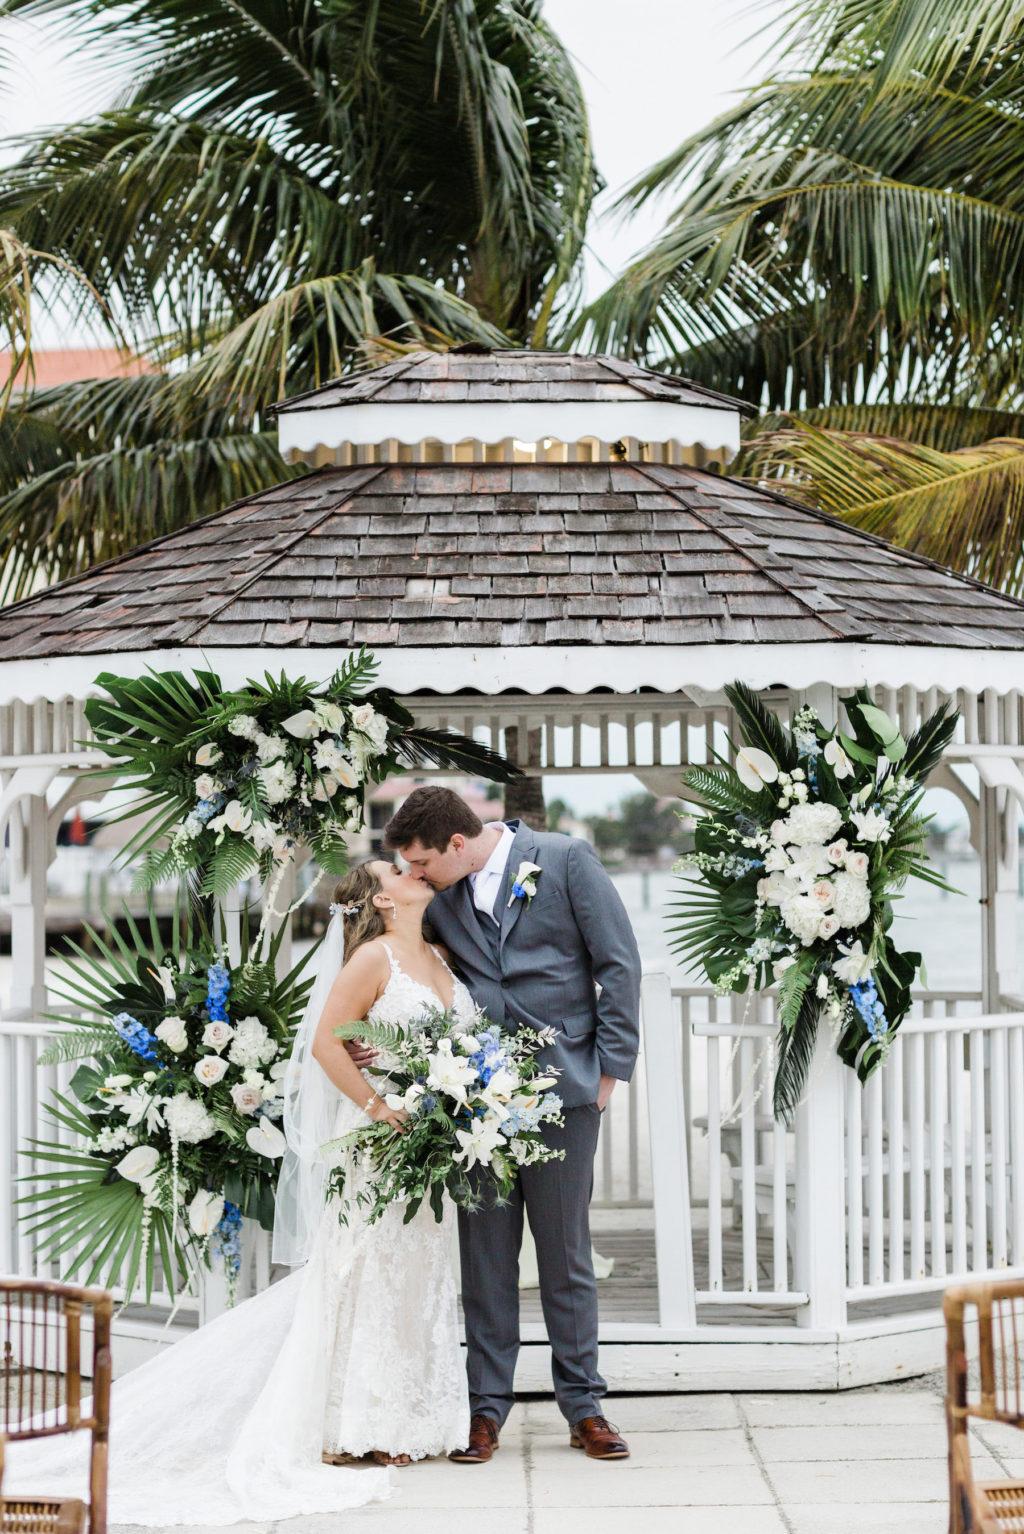 Bride and Groom Portraits at Beach Wedding Gazebo with Tropical Floral Arrangements | St. Pete Wedding Venue Isla Del Sol